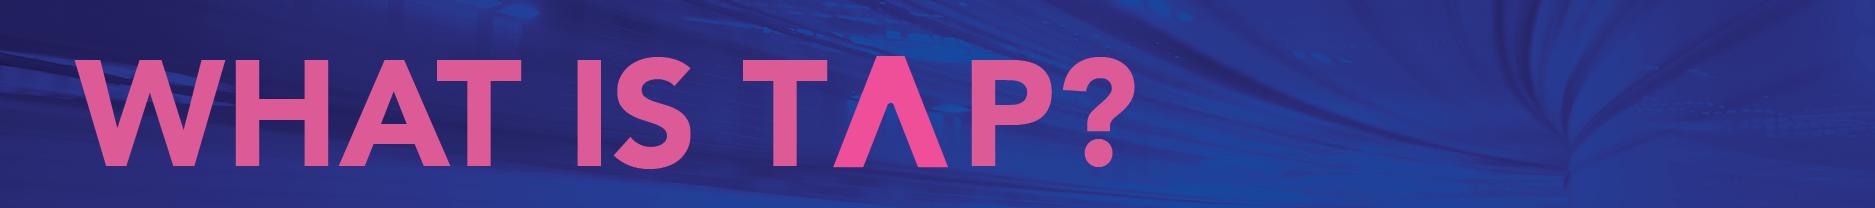 Trade Accelerator Program (TAP)